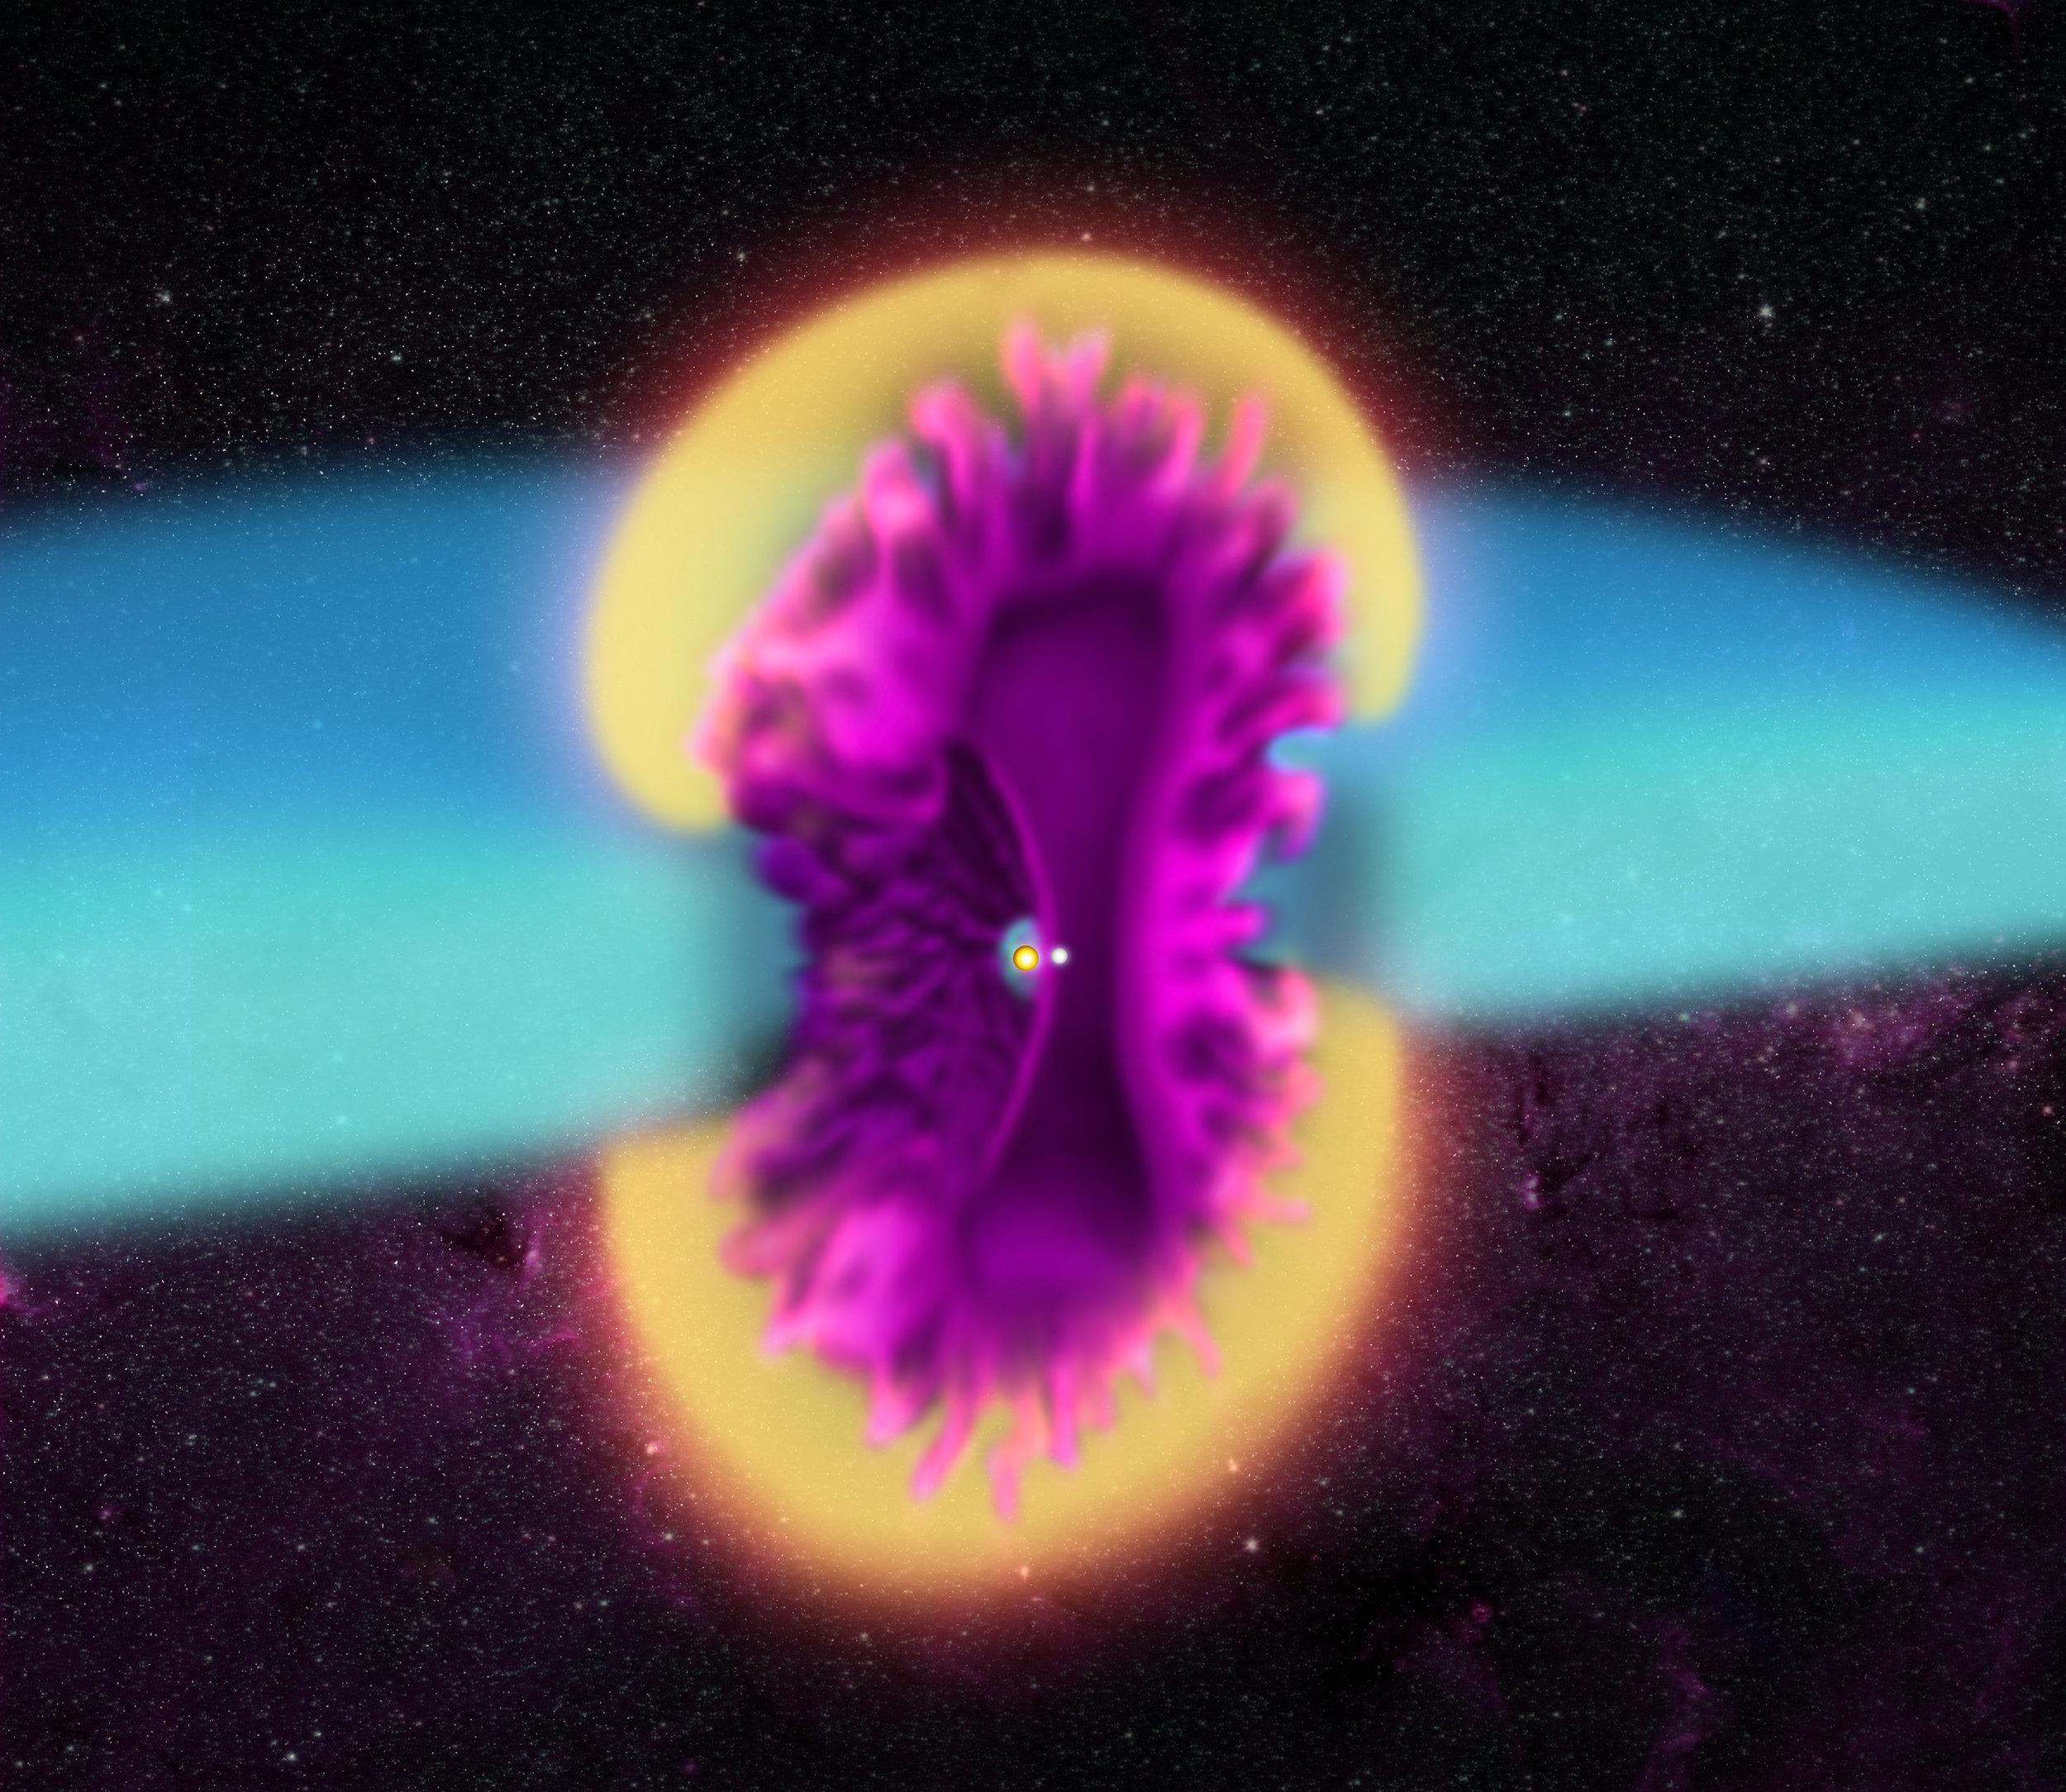 Image credit: Illustrated model: NASA/CXC/M.Weiss